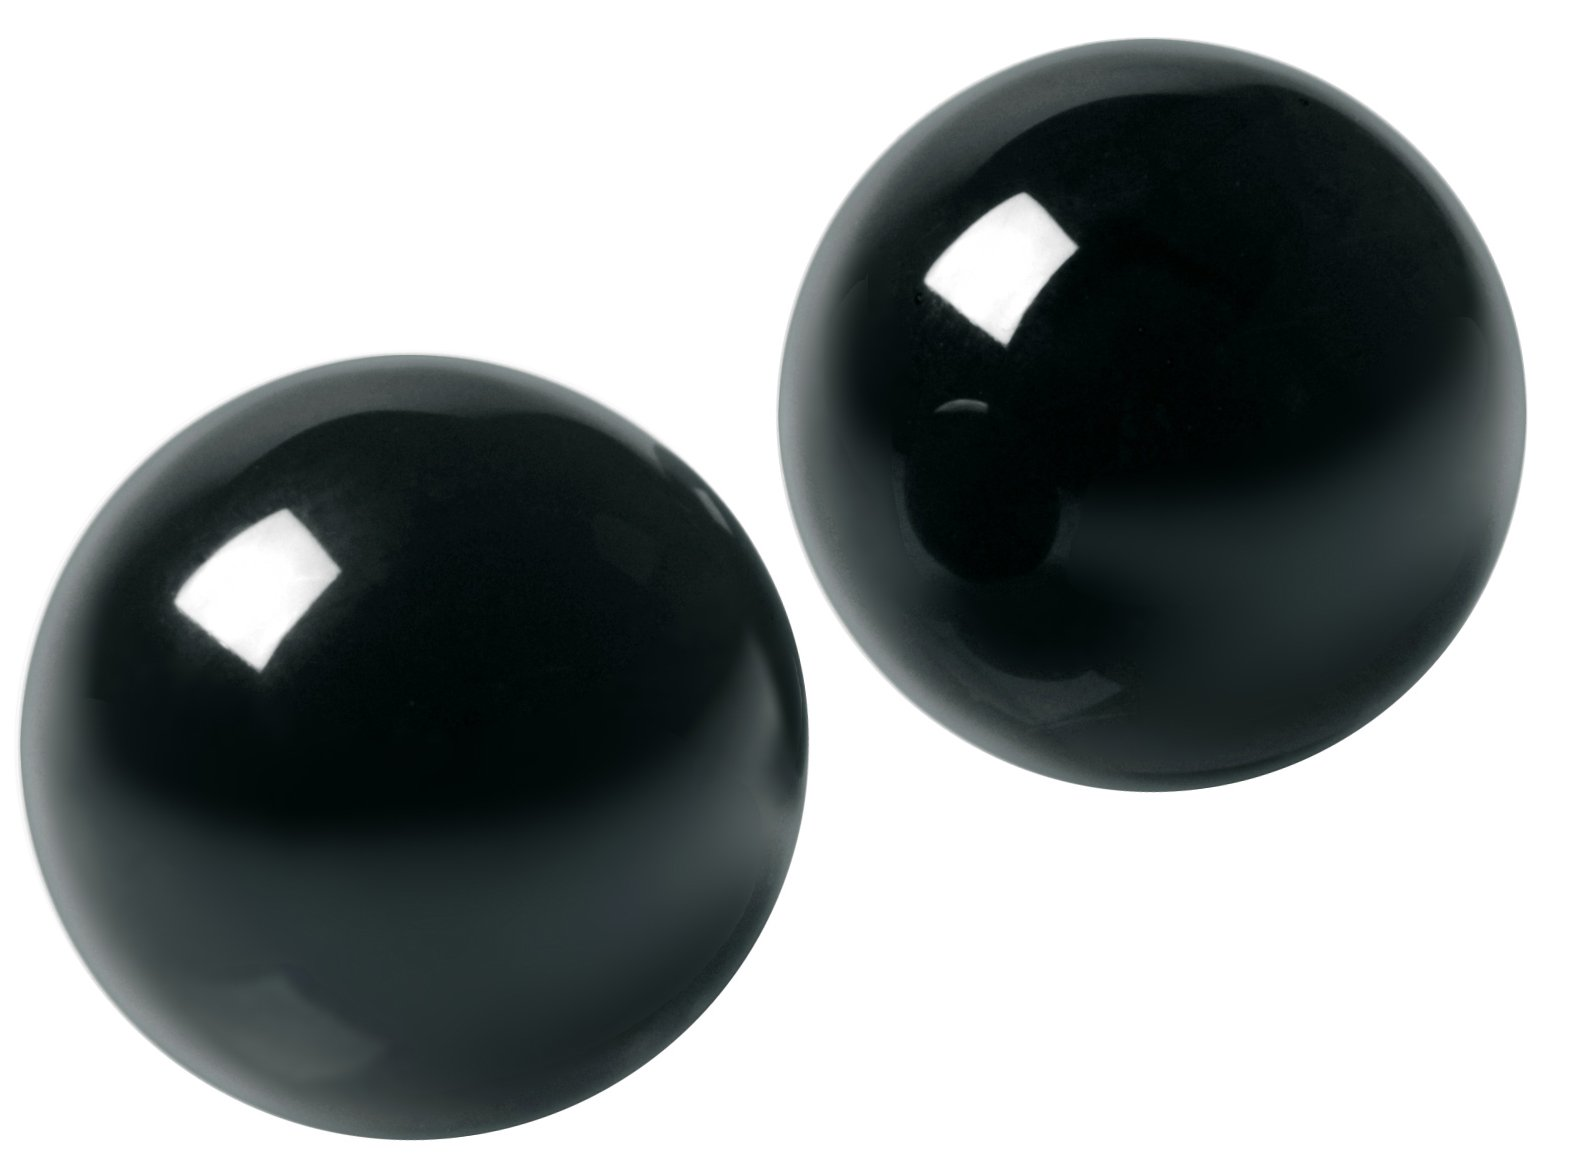 Master Series Jaded Glass Benwa Kegel Exercise Balls